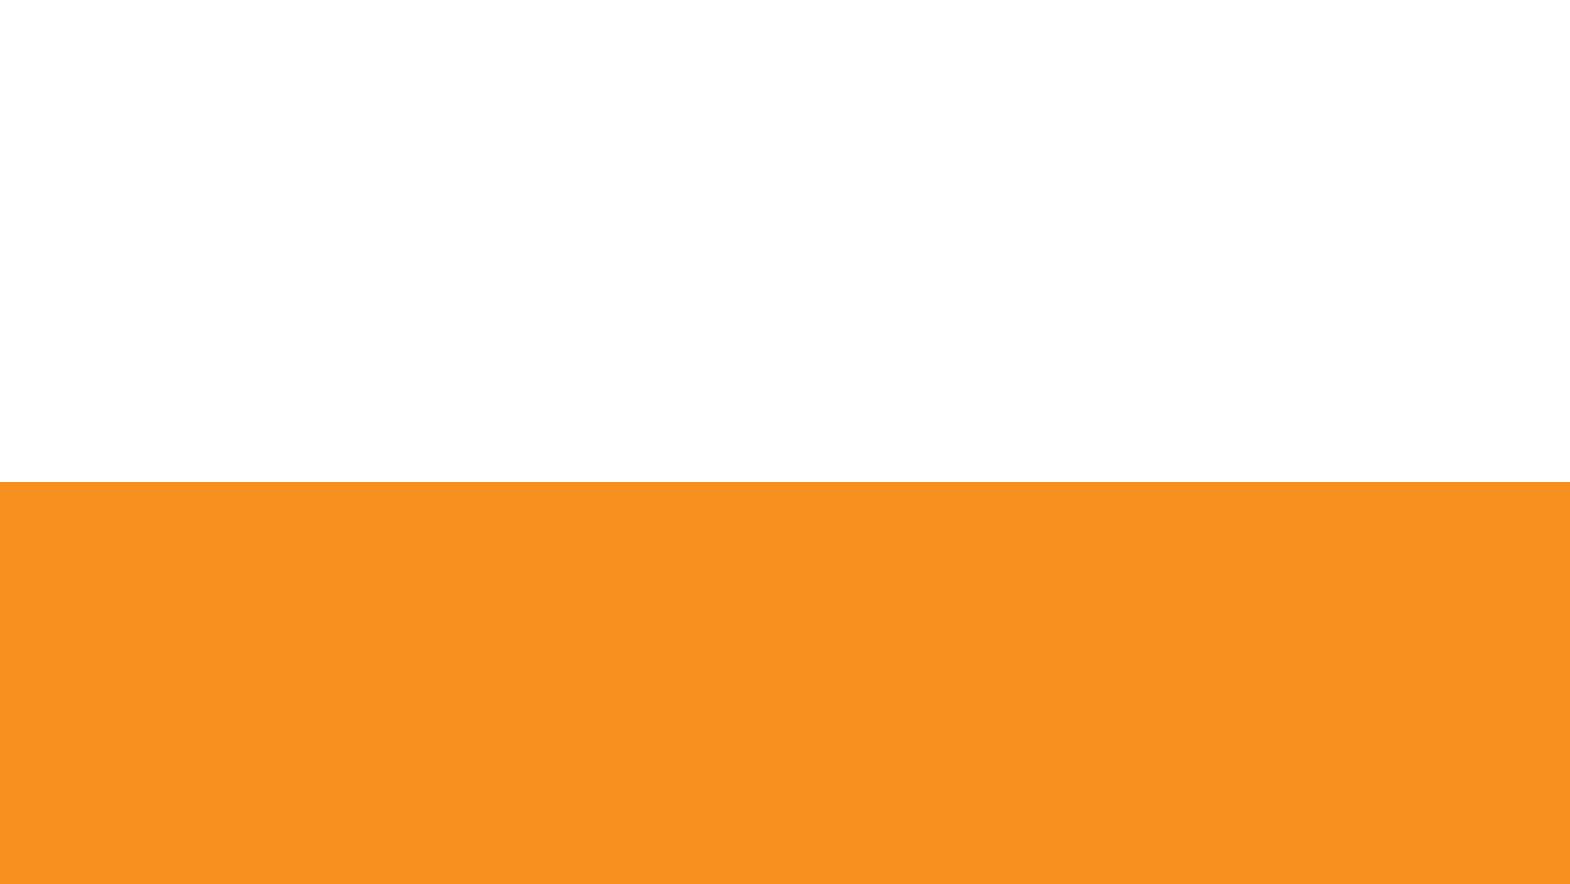 orange gradiant